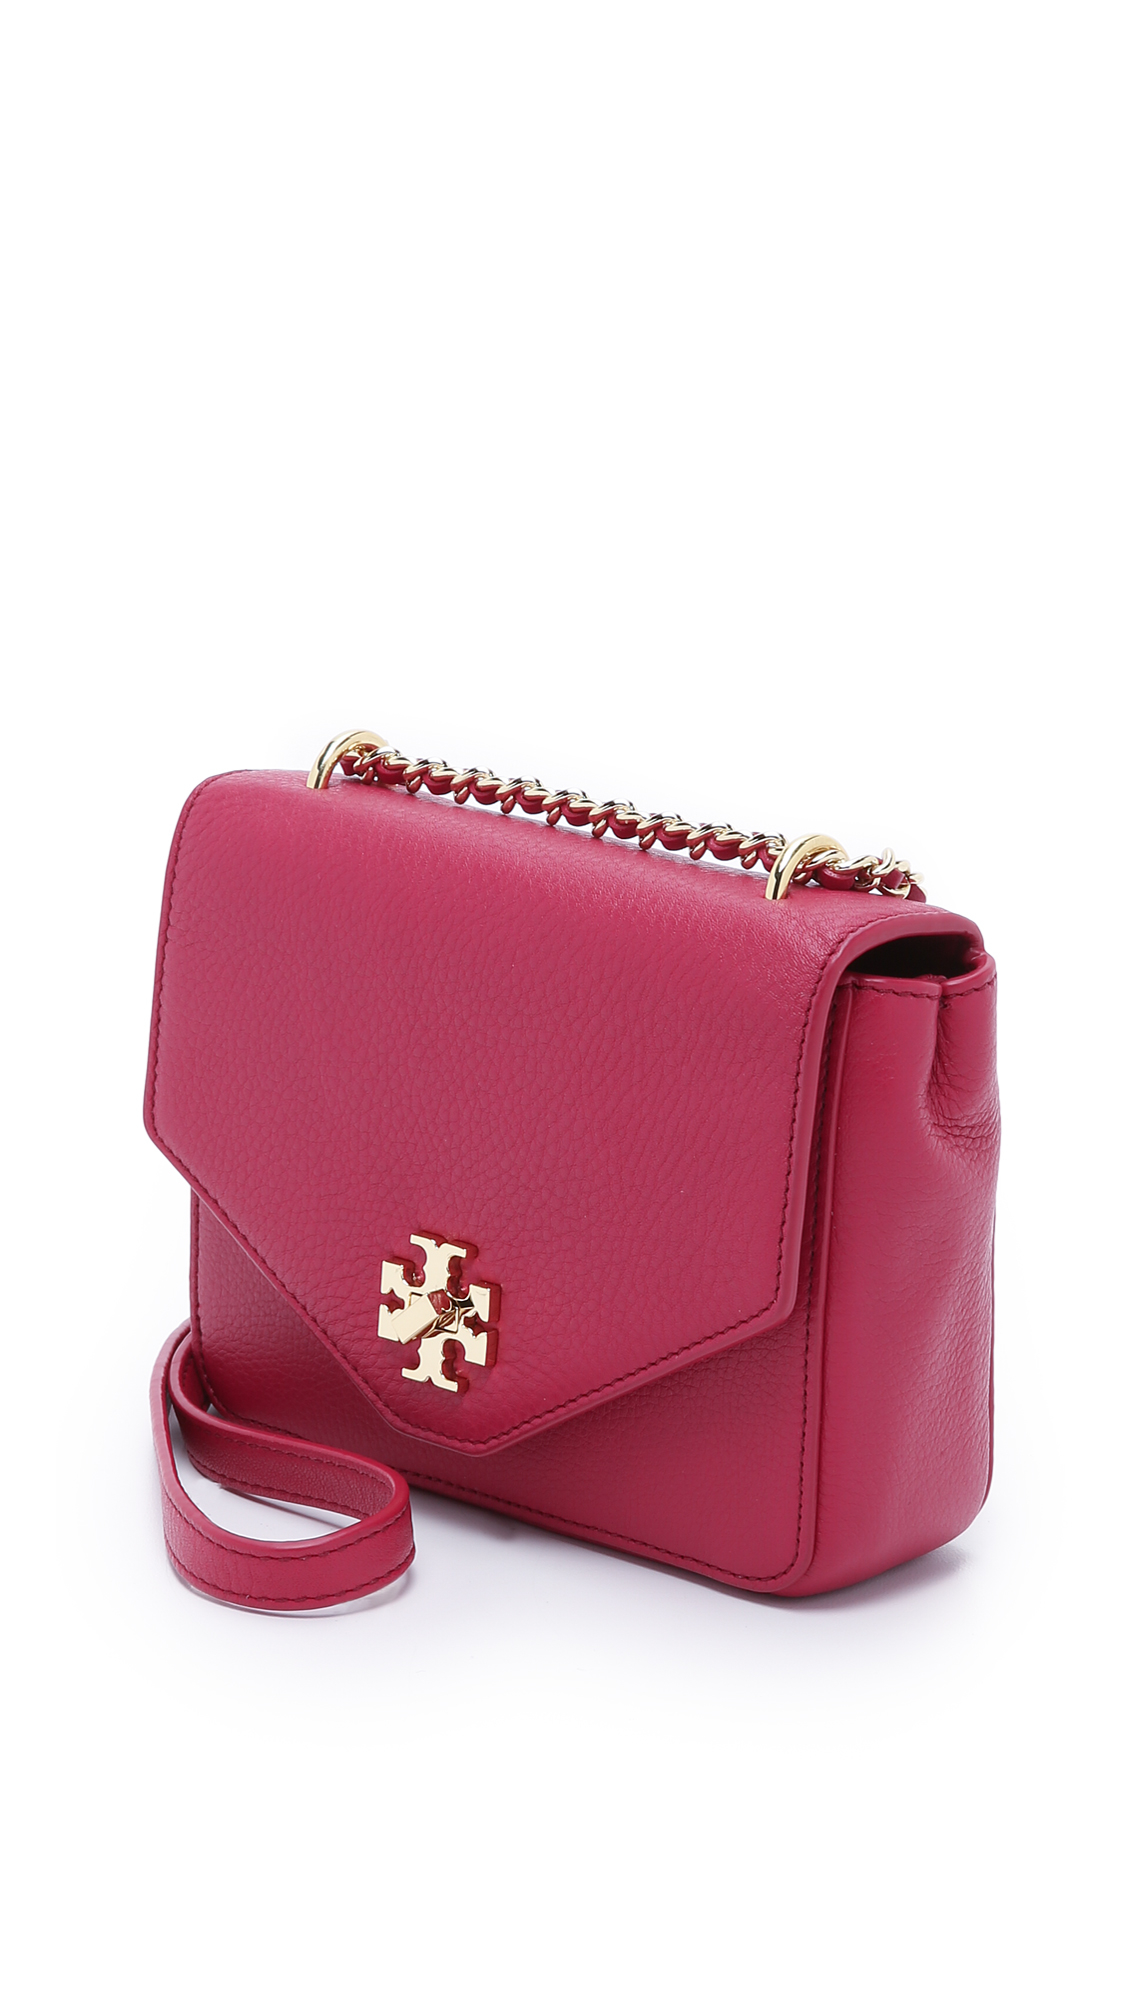 c66666d20f8 Tory Burch Kira Mini Chain Cross Body Bag - Raspberry in Red - Lyst